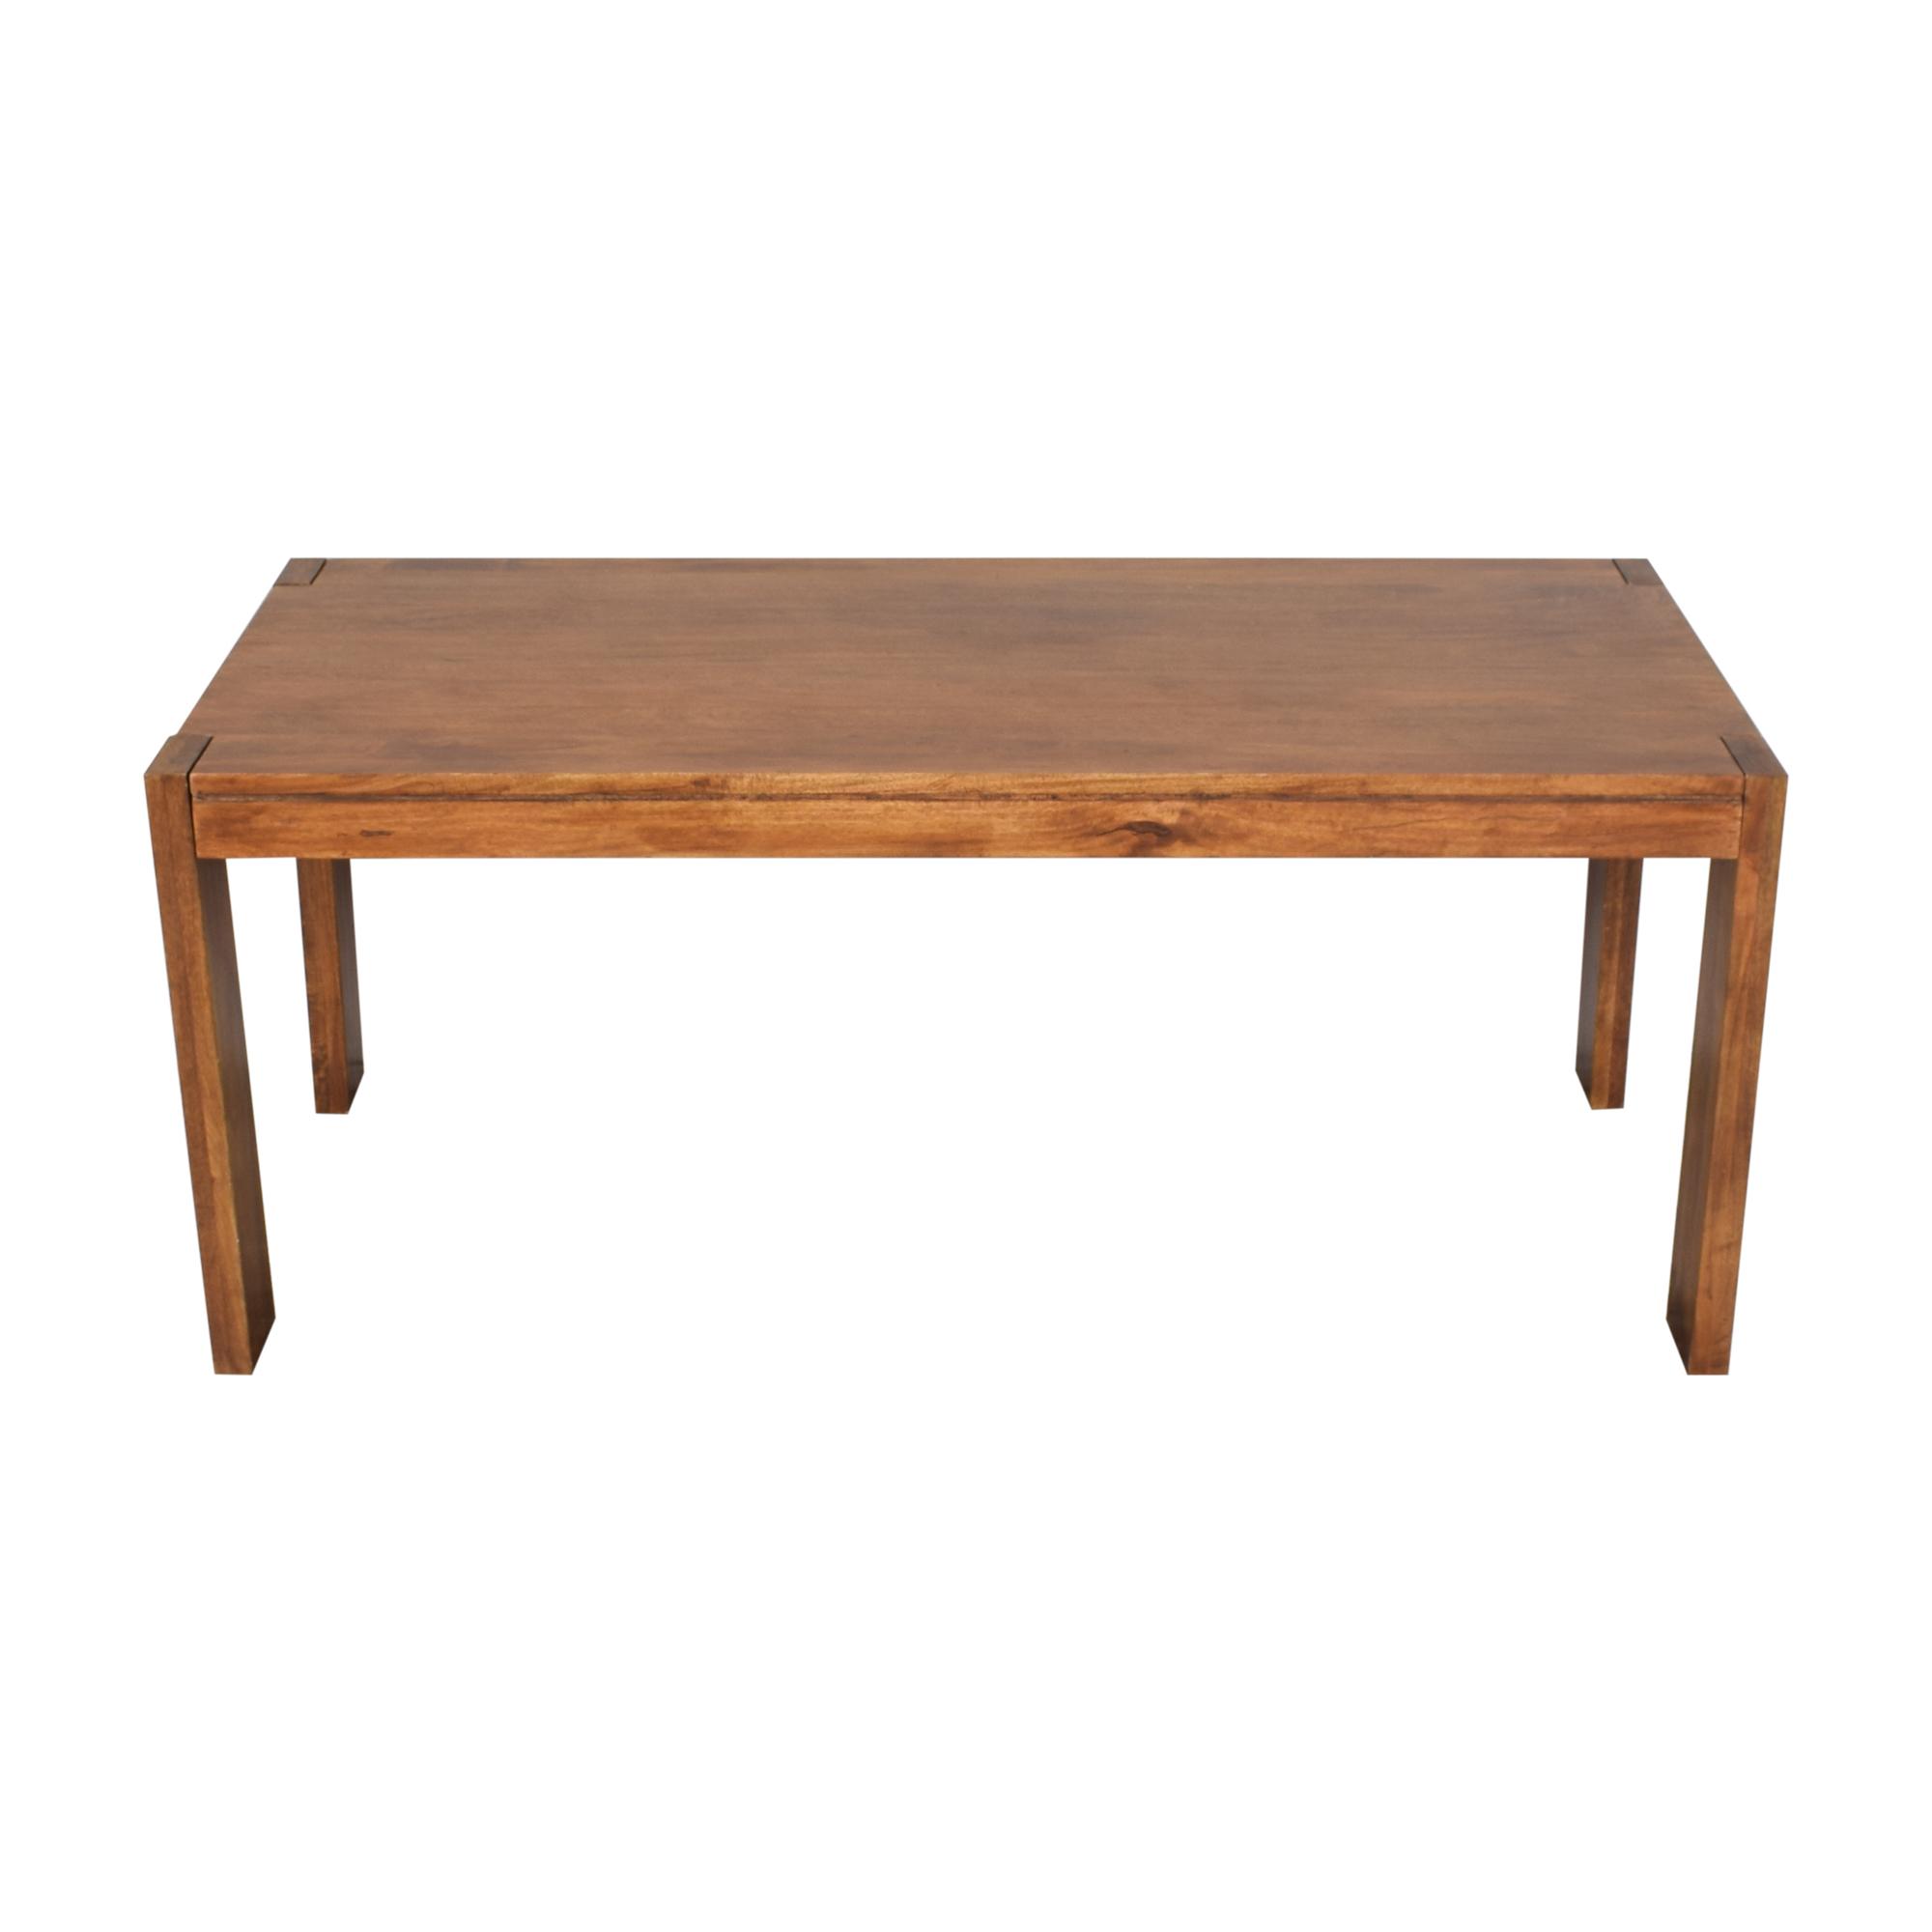 West Elm West Elm Boerum Dining Table used